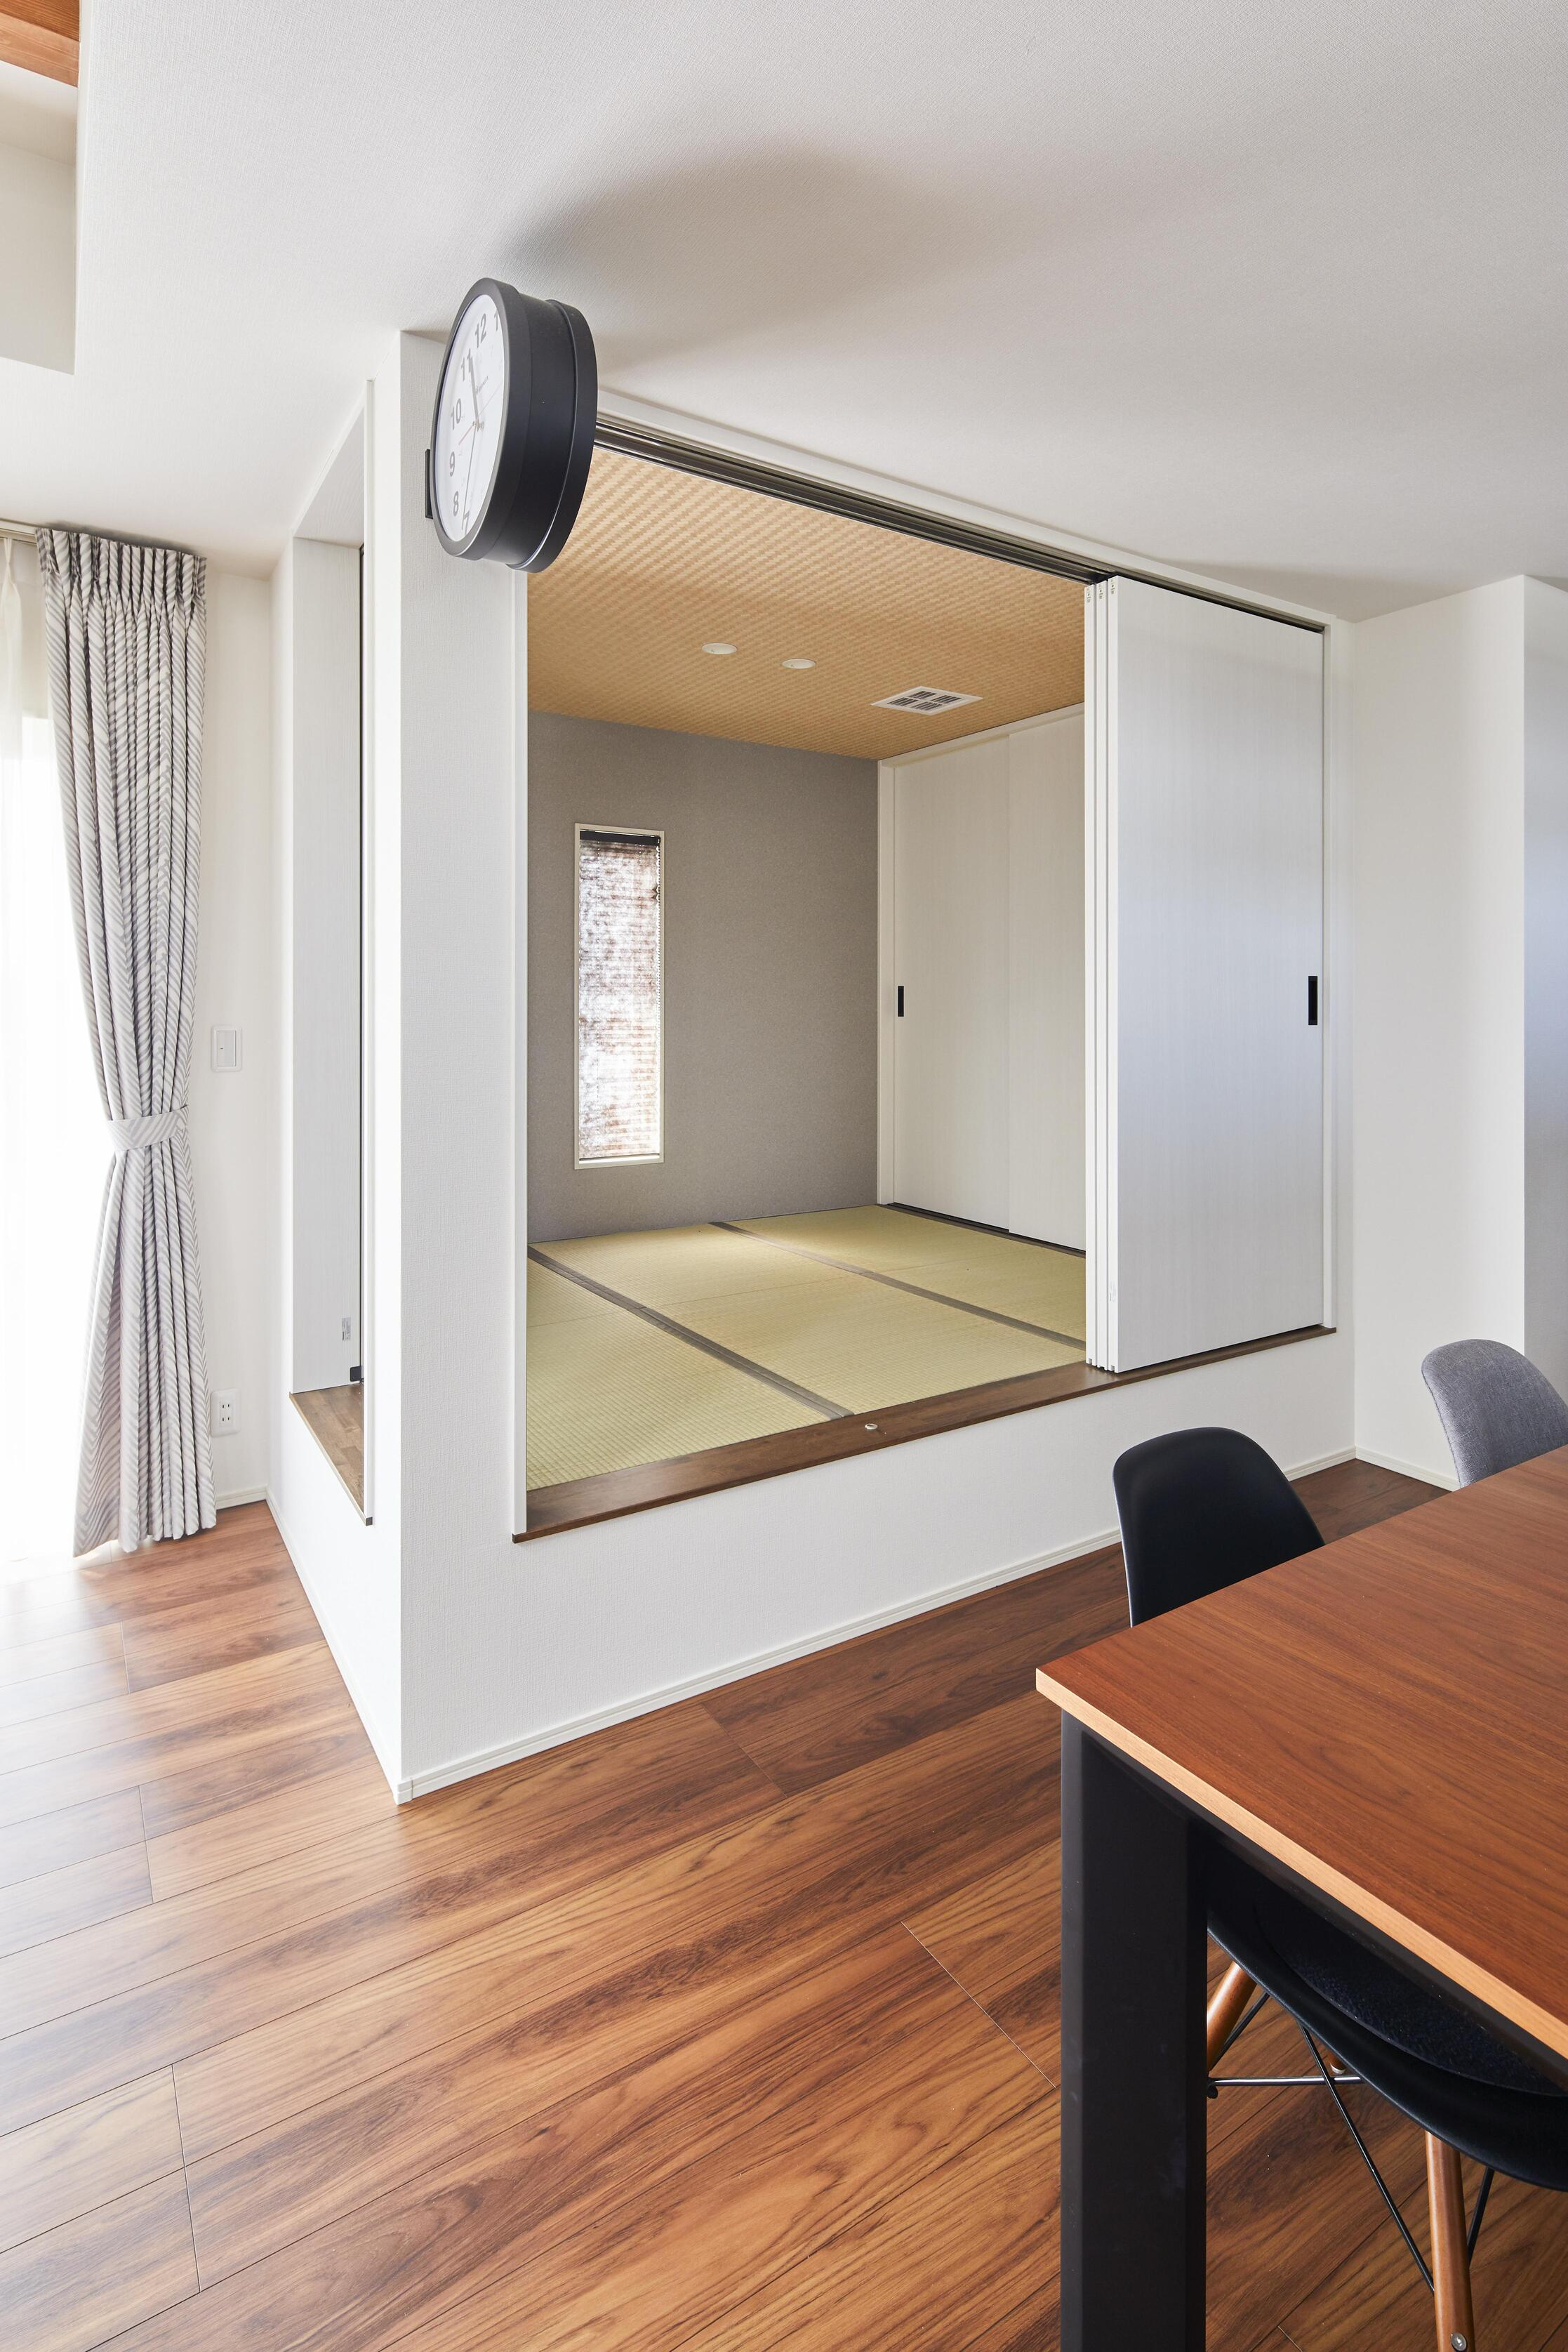 LDKの一角には畳コーナー(和室)も設置。来客の際は客間としても活用できる